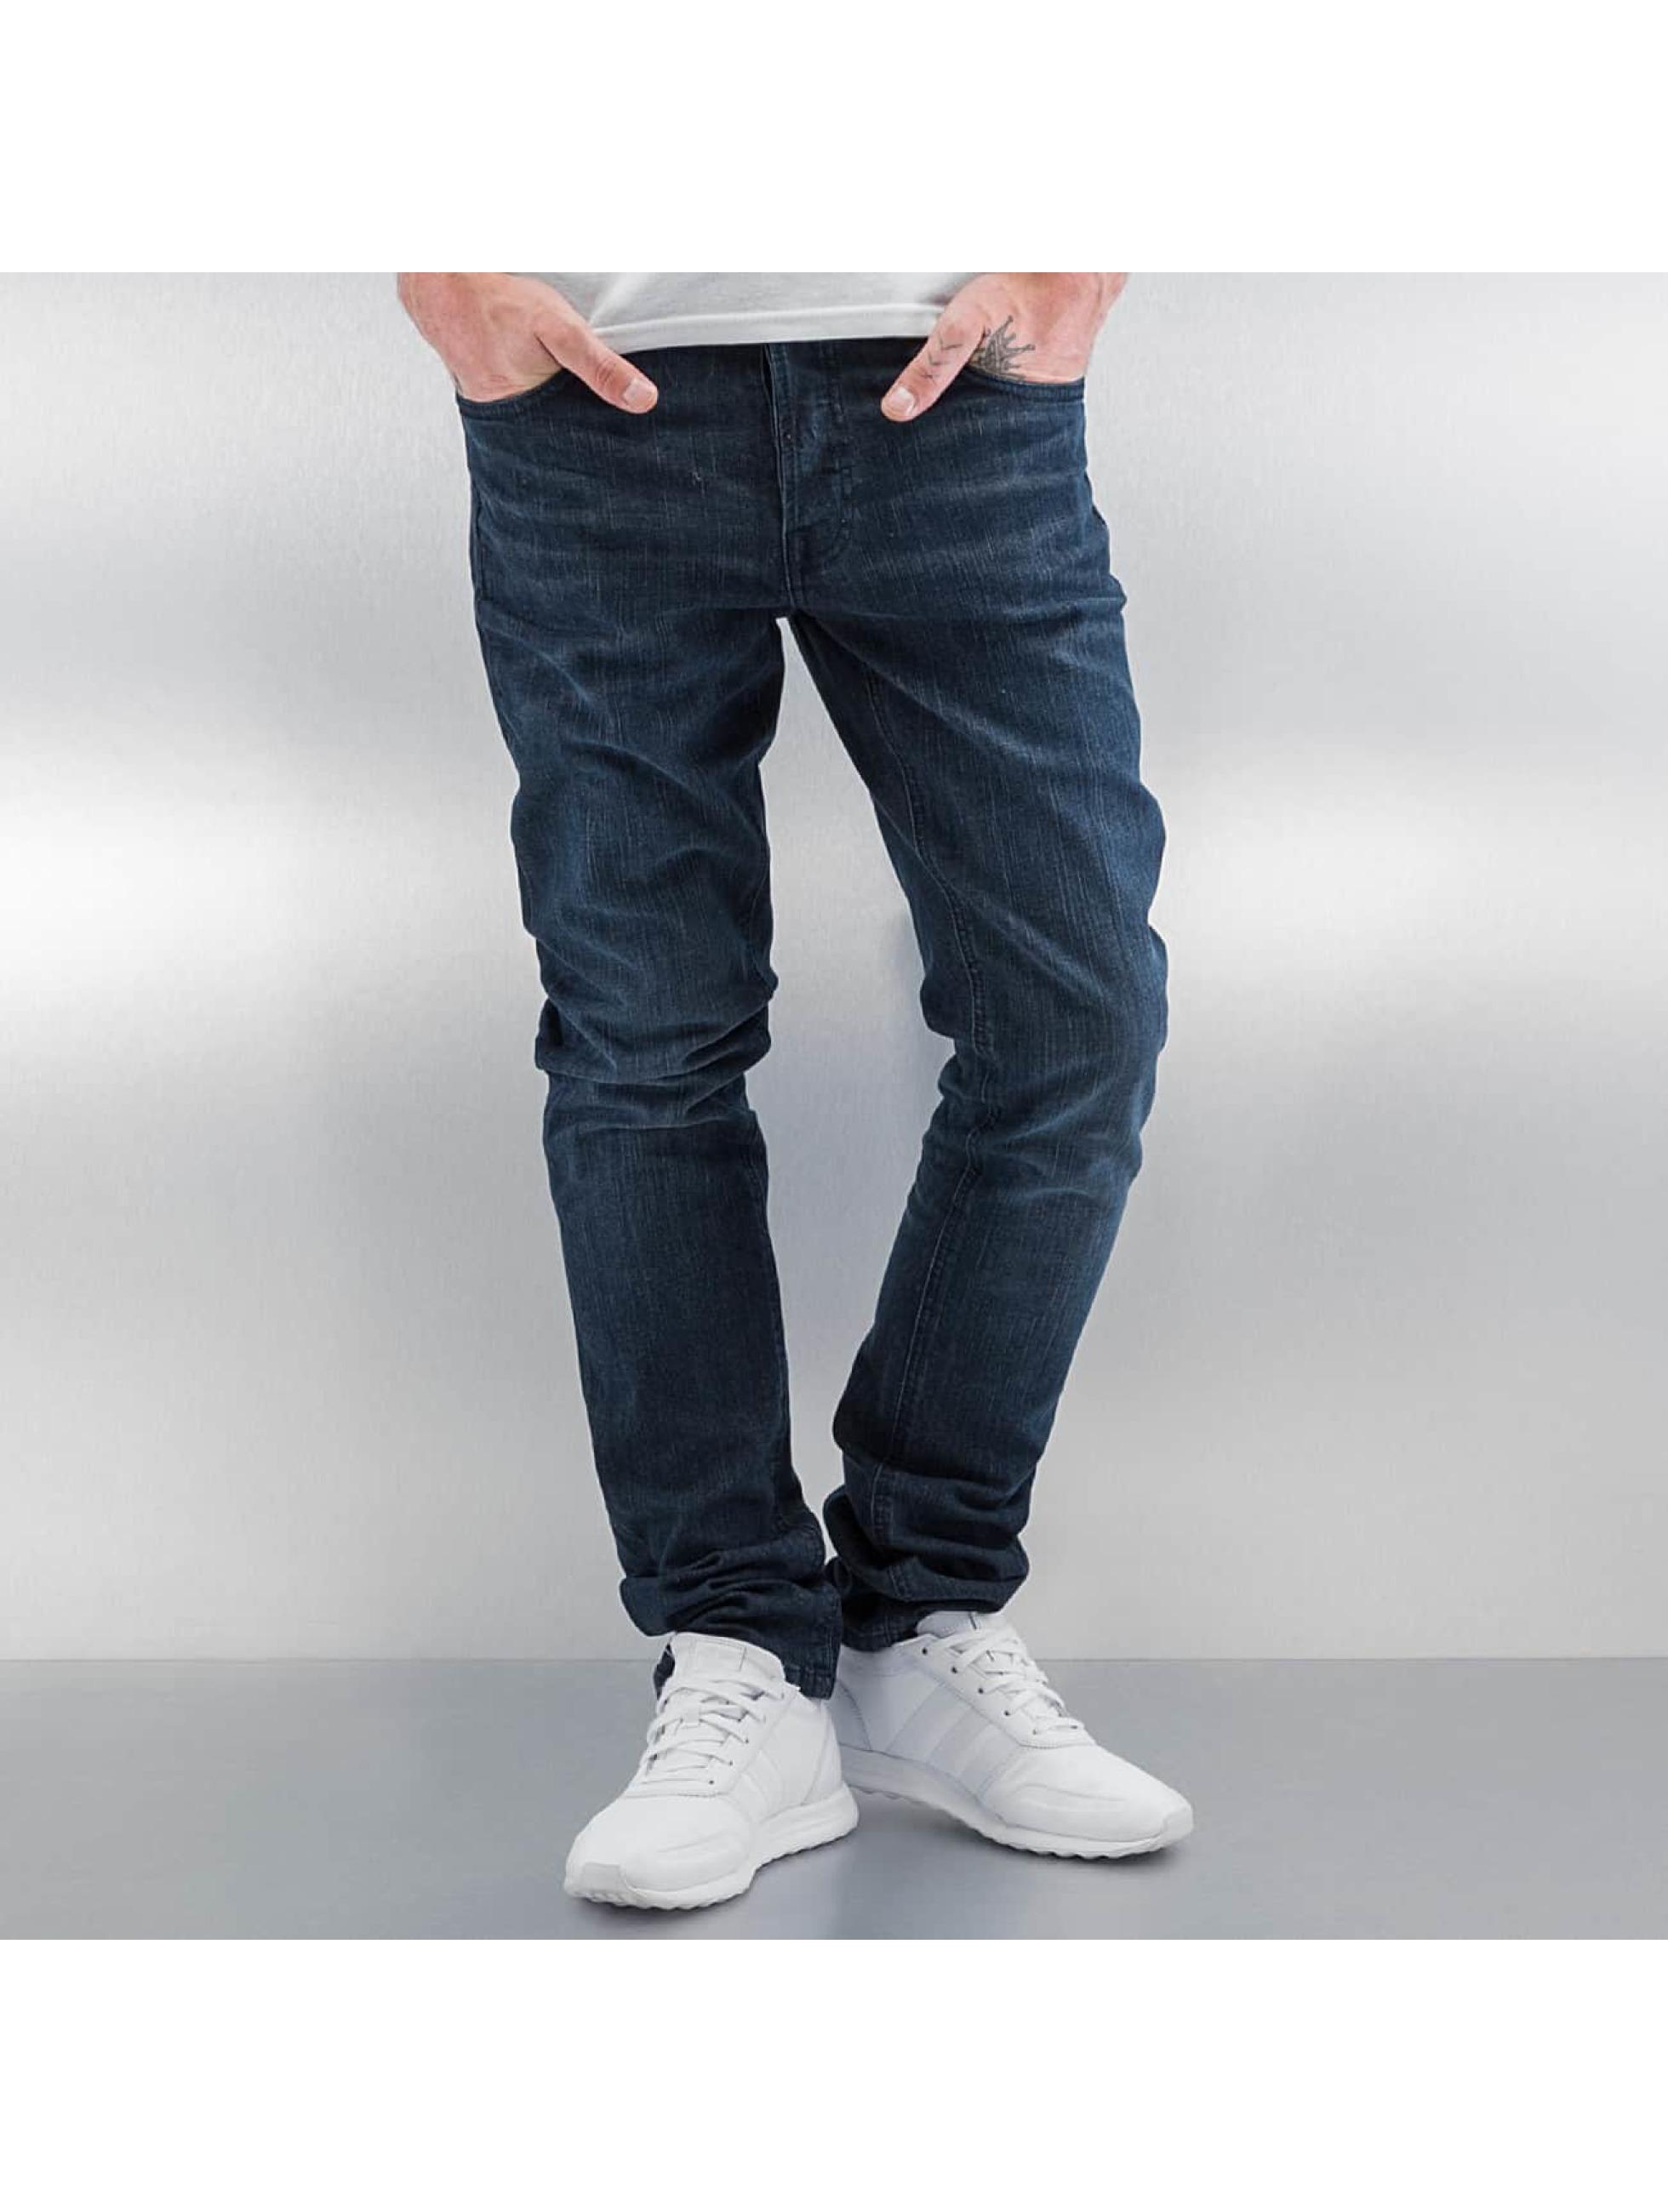 Amsterdenim Männer Skinny Jeans Wash in blau